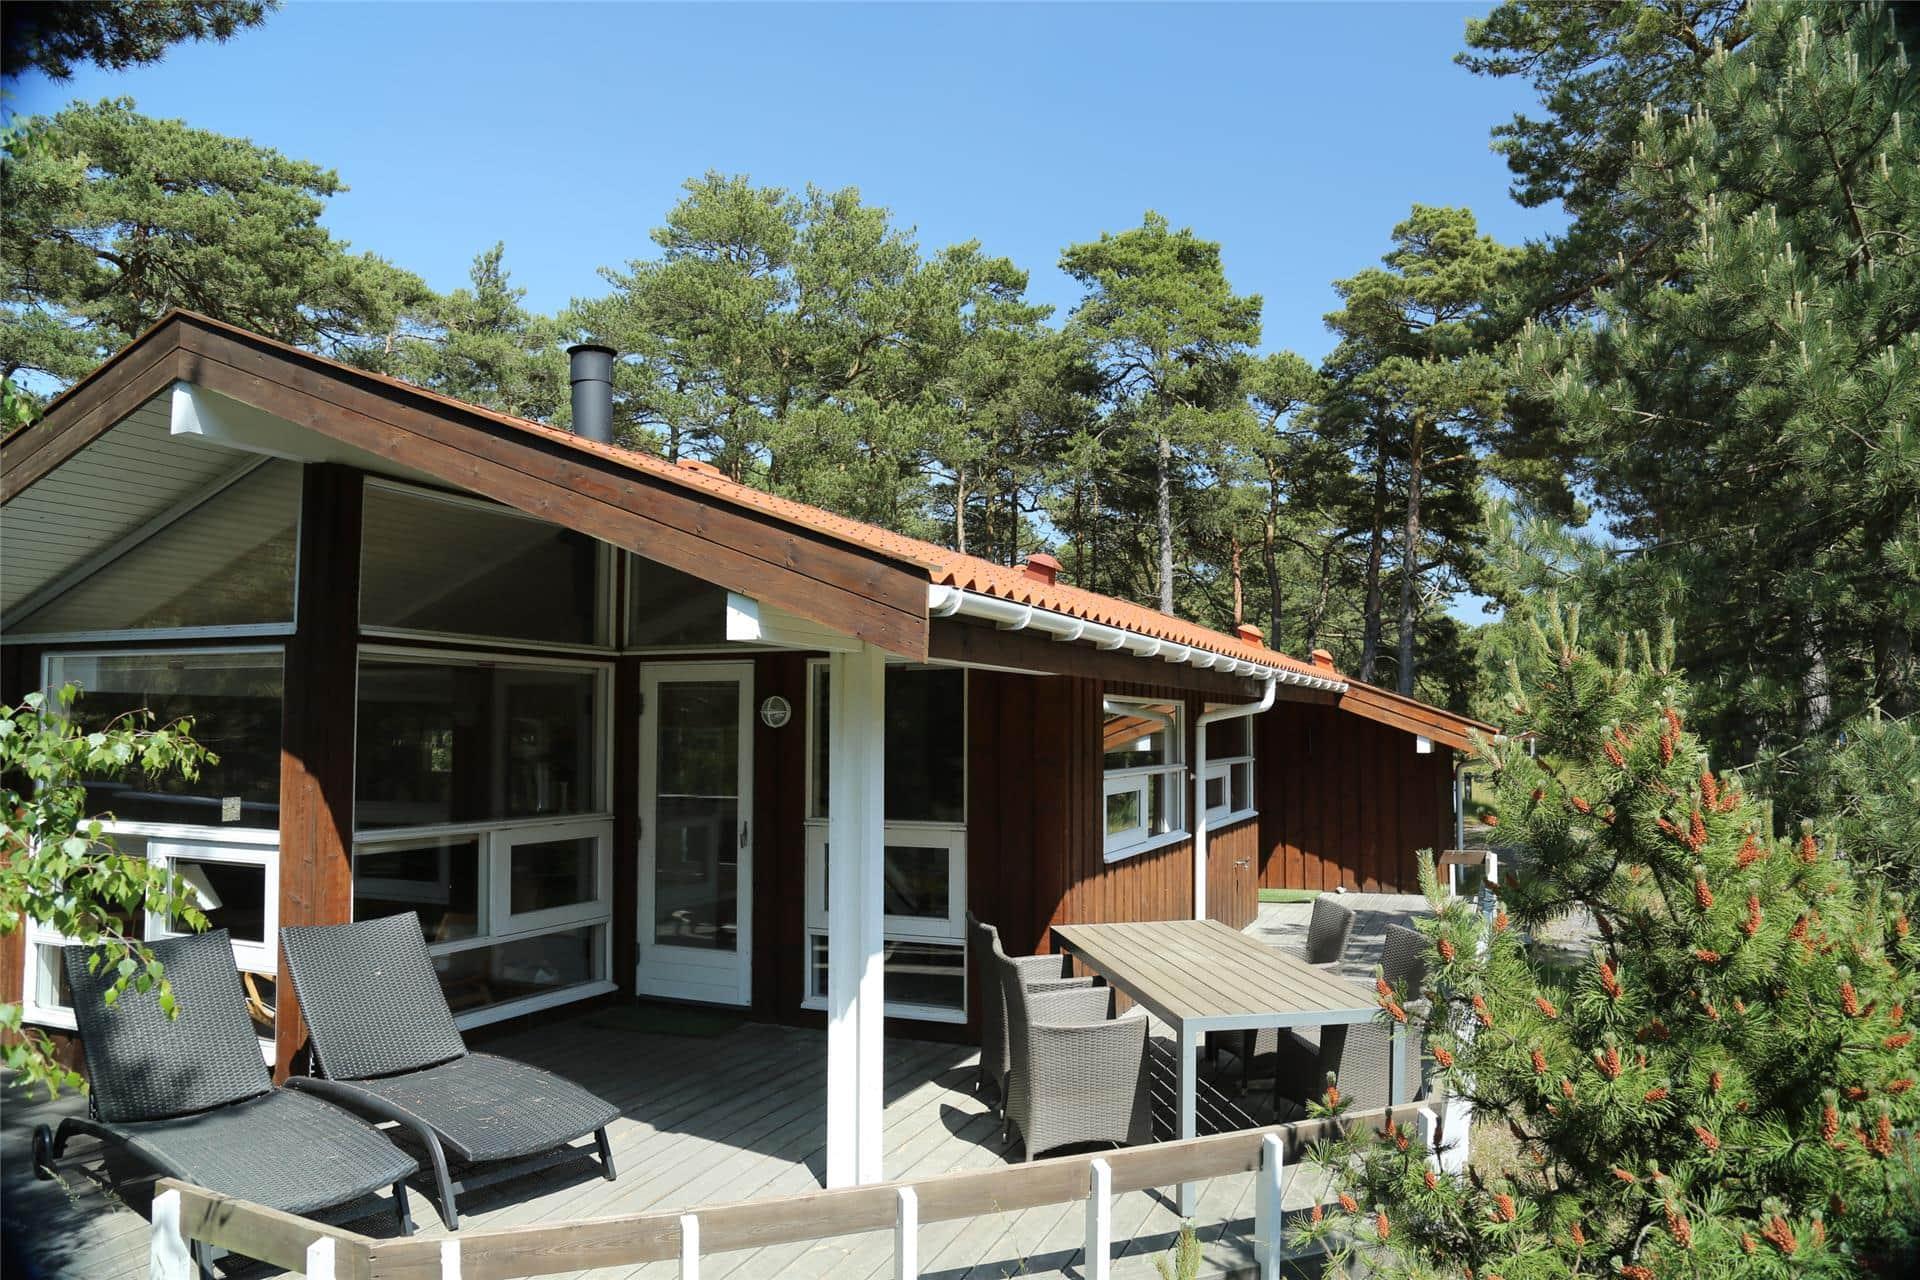 Billede 1-10 Sommerhus 2650, Skovsangervej 14, DK - 3730 Nexø